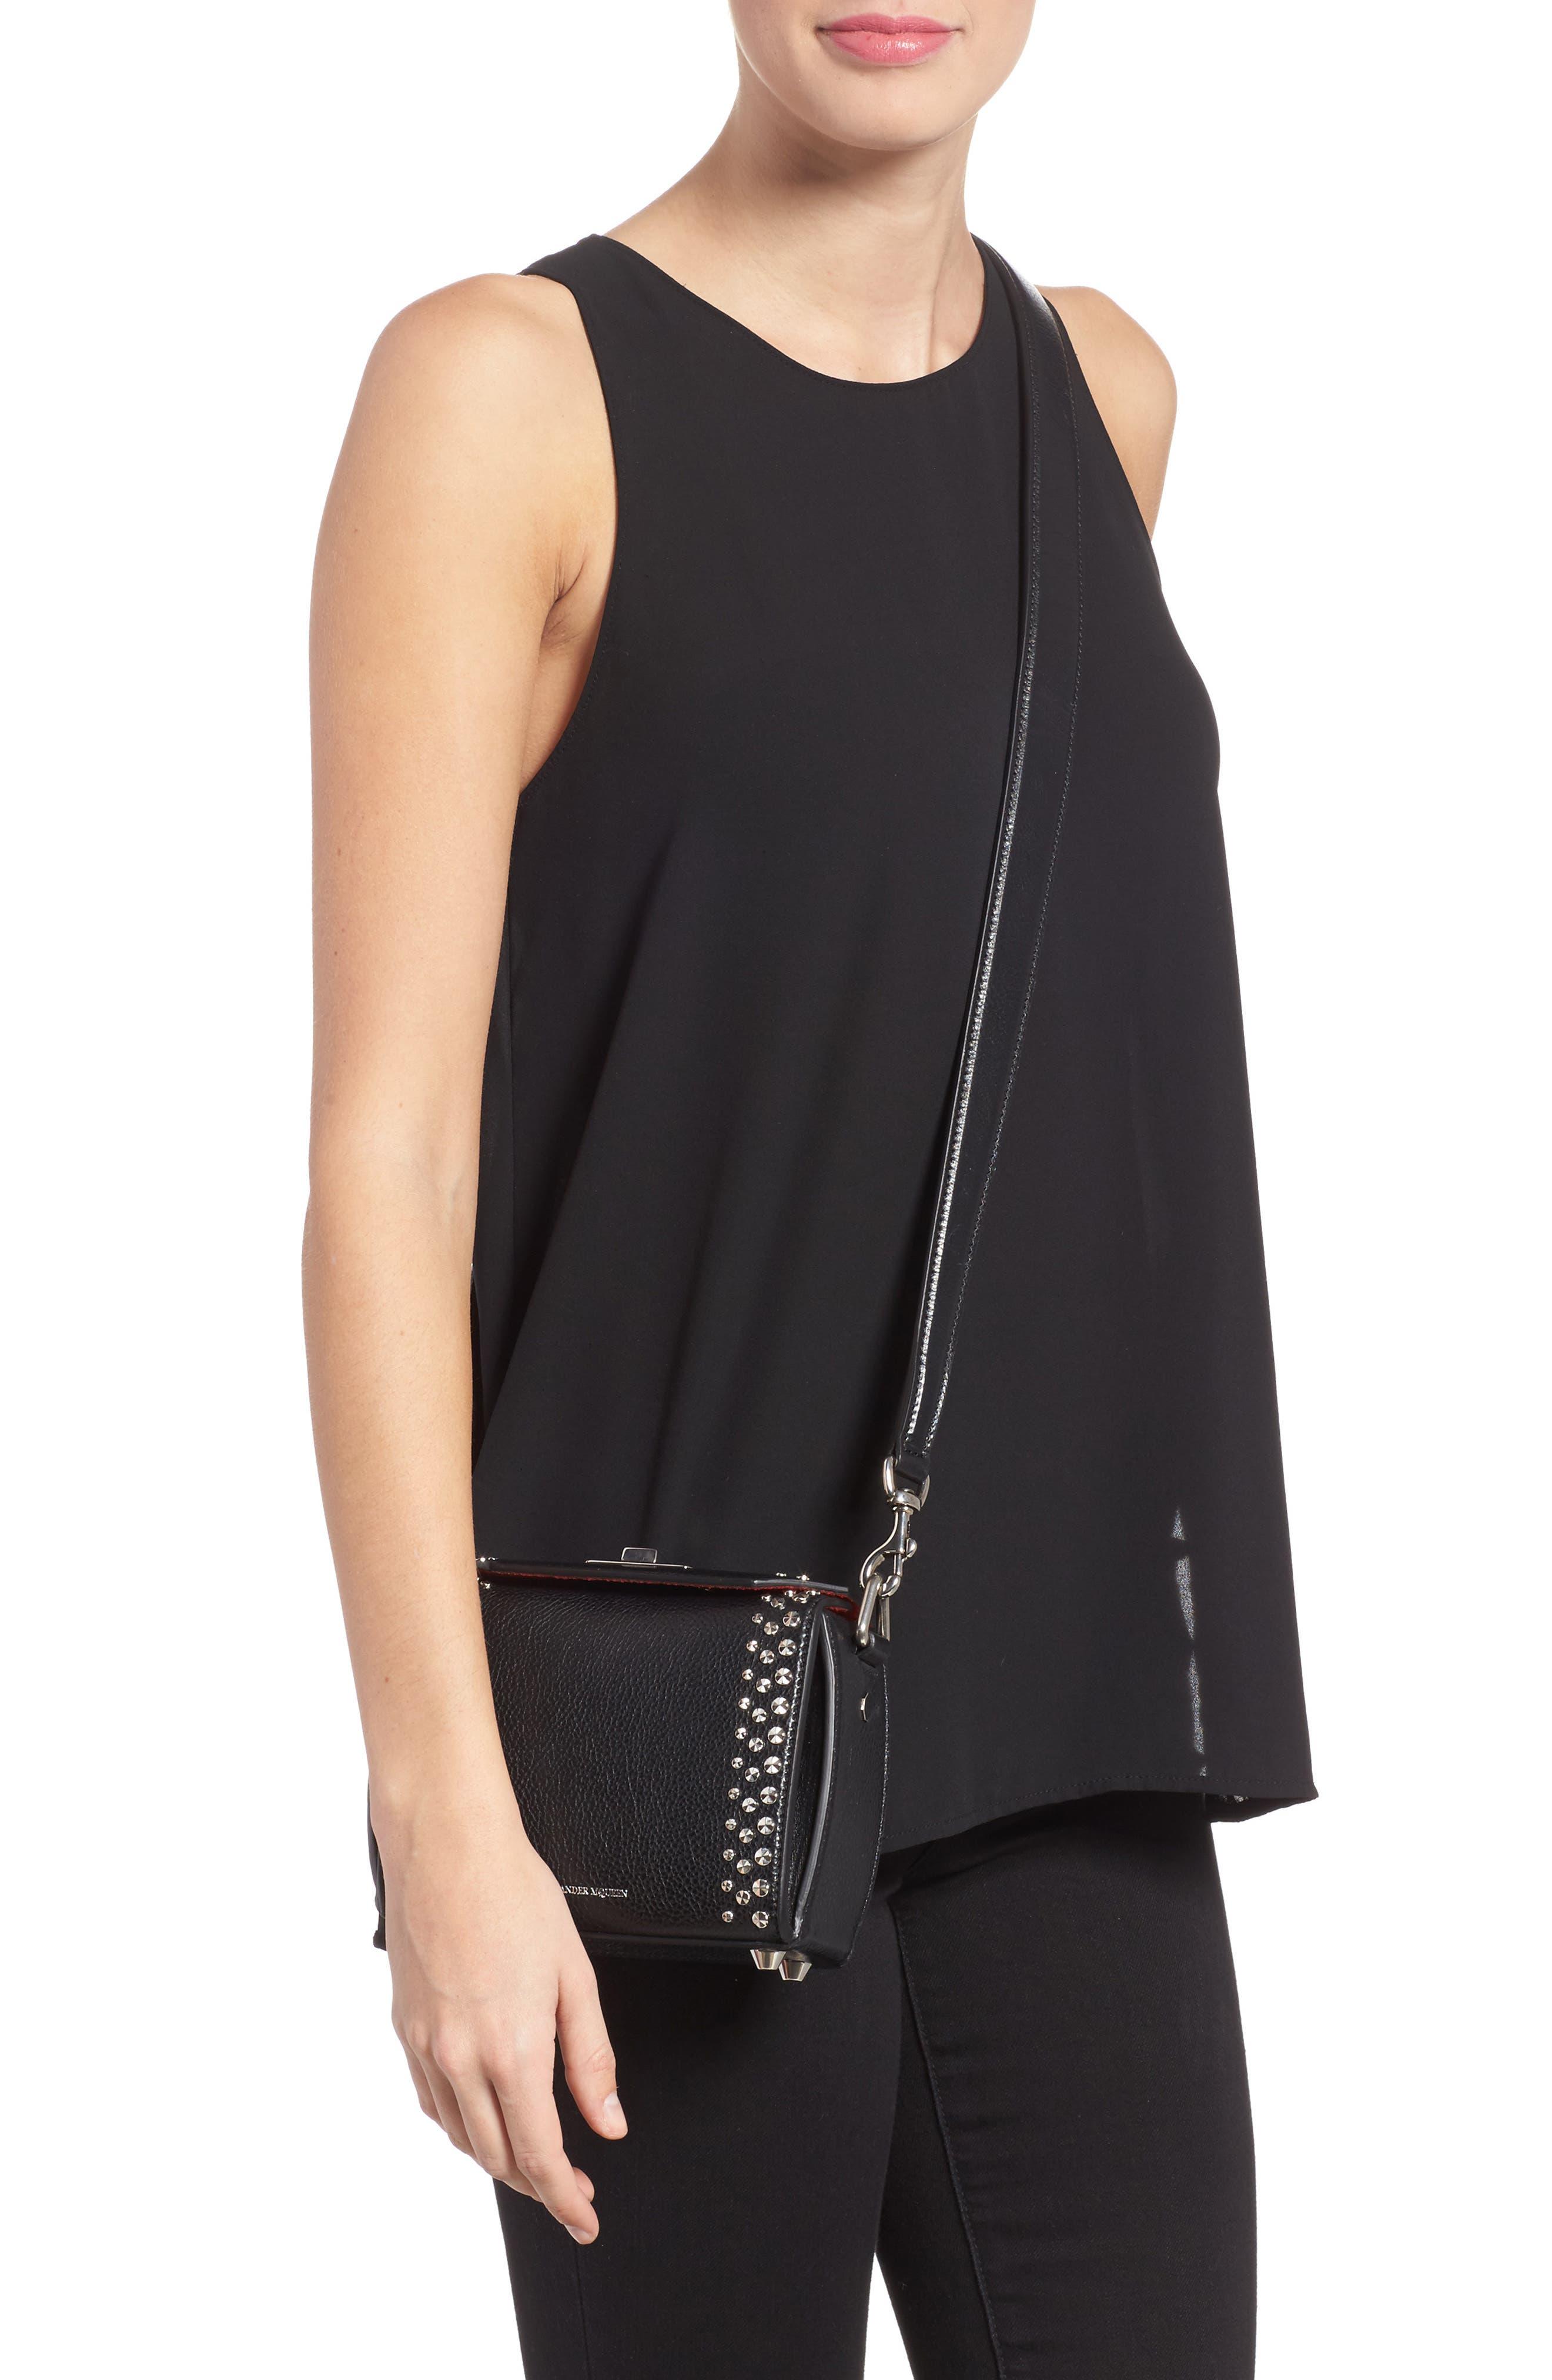 Alternate Image 2  - Alexander McQueen Box Bag 16 Studded Leather Bag